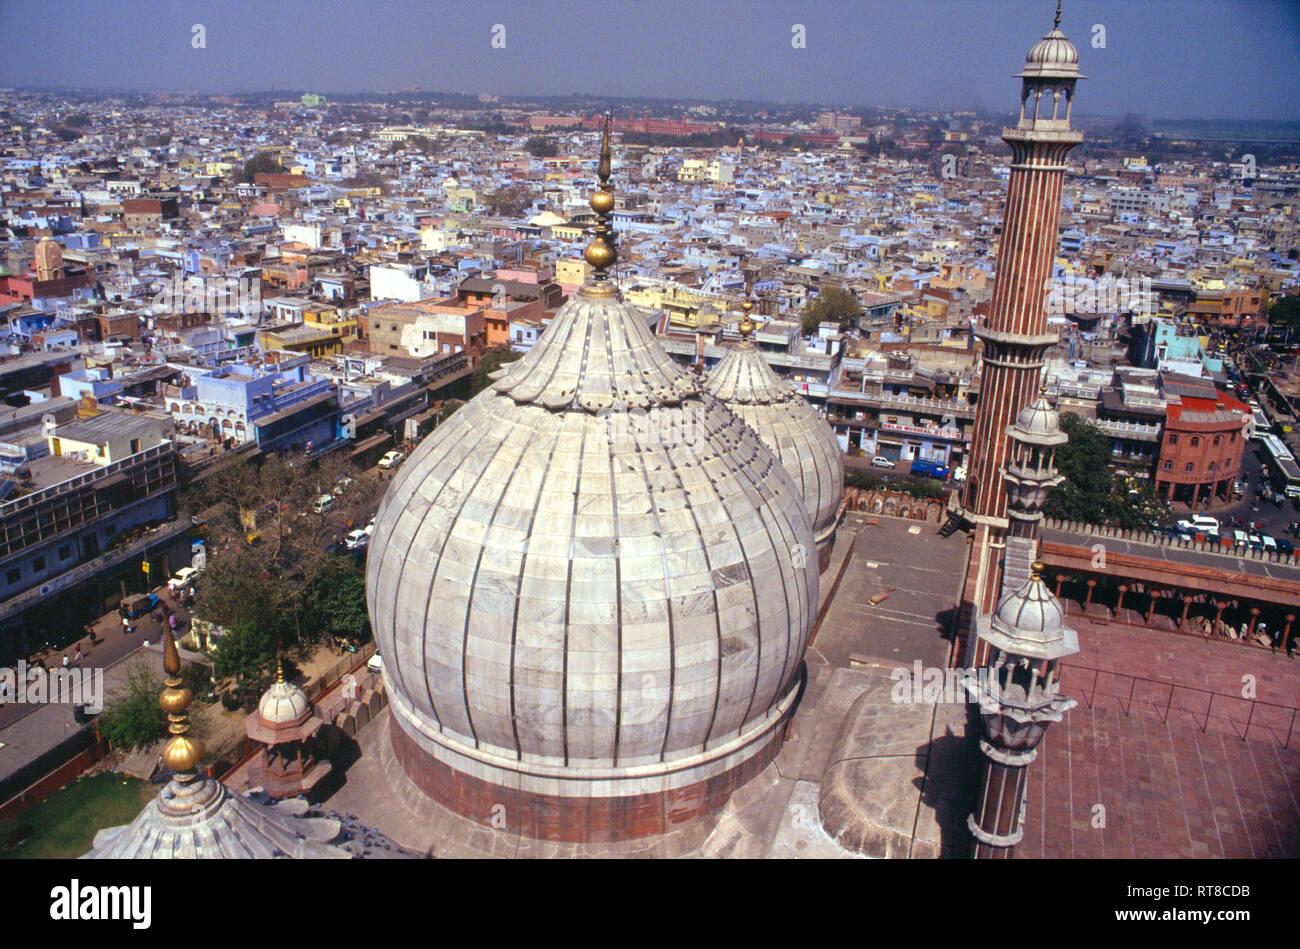 View overlooking Old Delhi formThe Masjid-i Jahān-Numā, Jama Masjid, Friday Mosque, built by, Mughal Emperor, Shah Jahan, 1644 and 1656, Delhi, India, - Stock Image